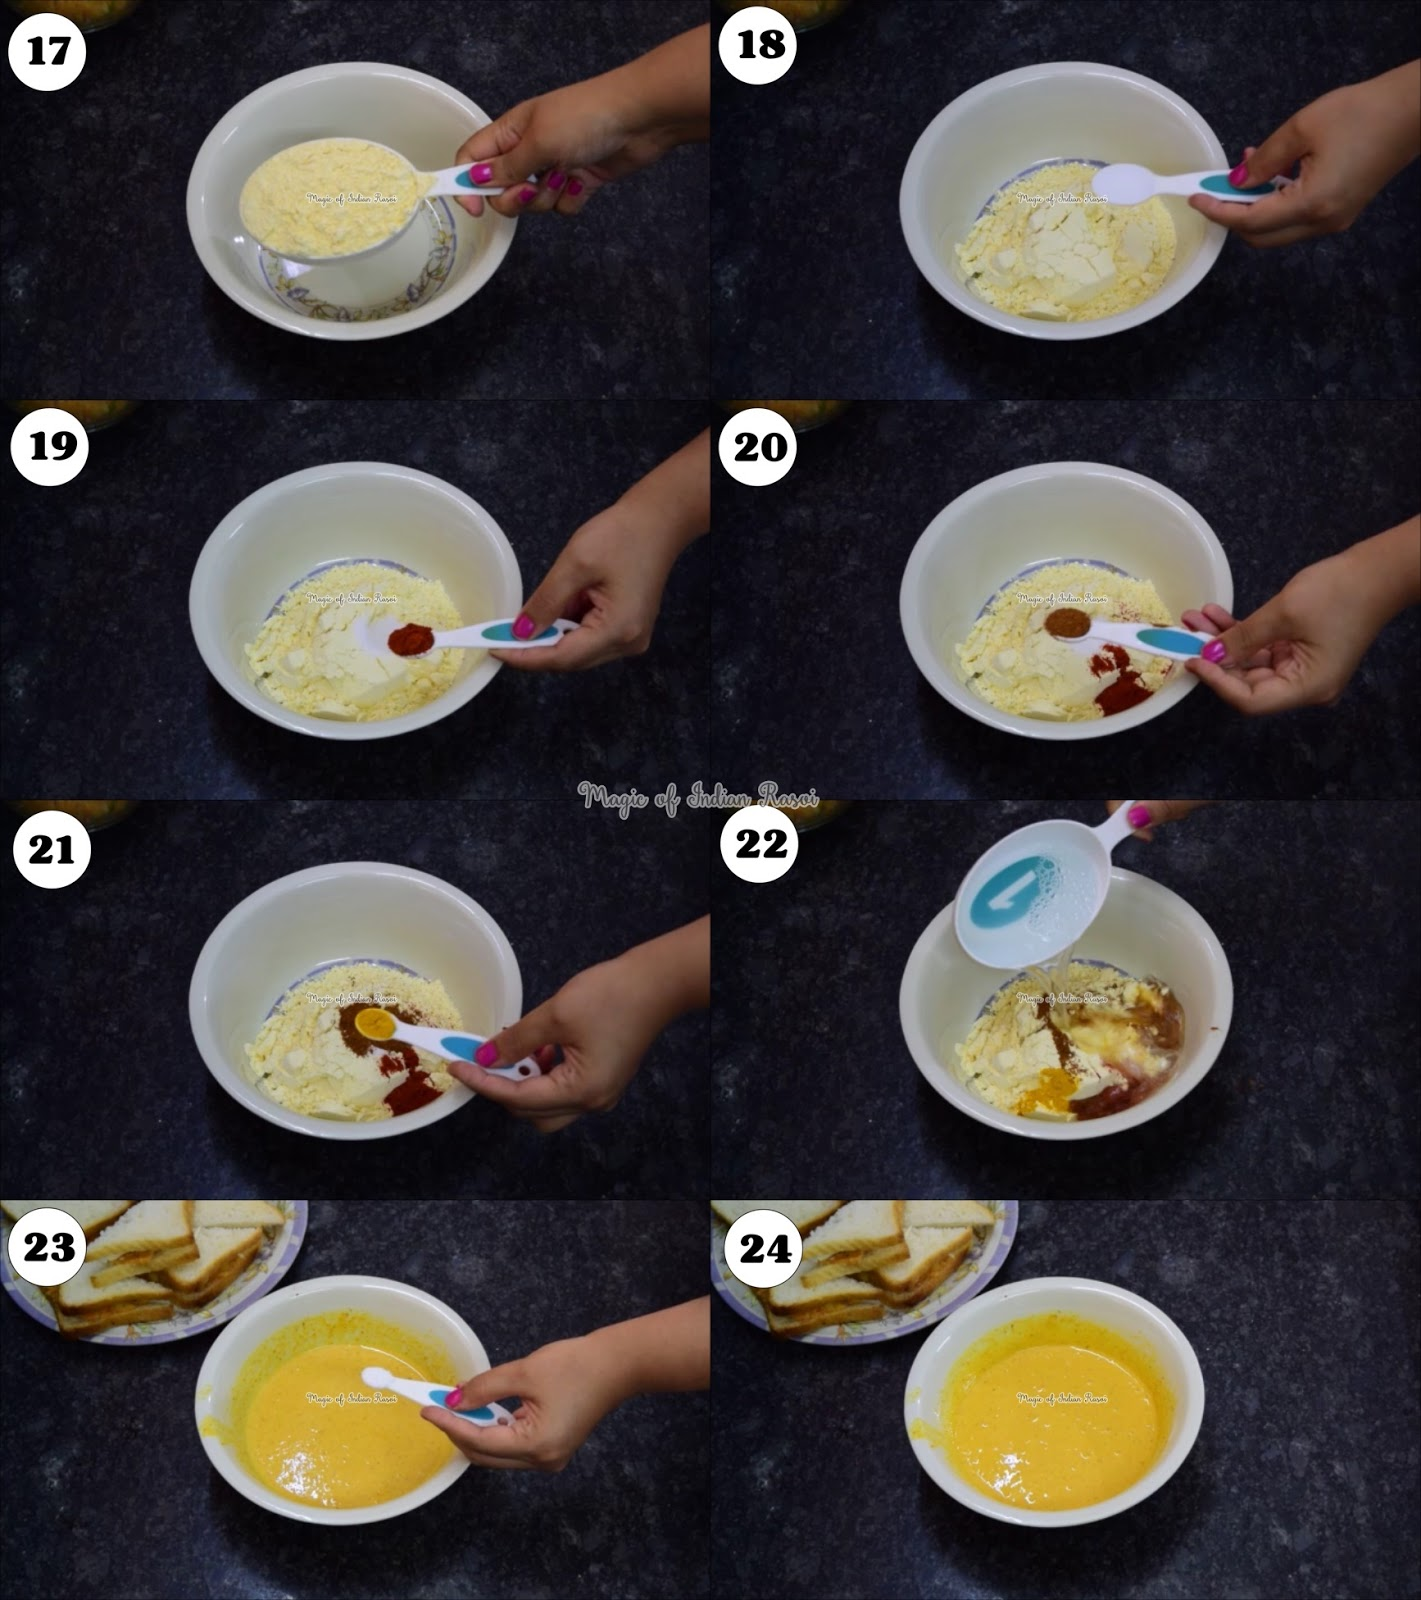 Bread Paneer Pakora - Street Food Snack Recipe - ब्रेड पनीर पकोड़ा - स्ट्रीट फूड स्नैक्स रेसिपी - Priya R - Magic of Indian Rasoi